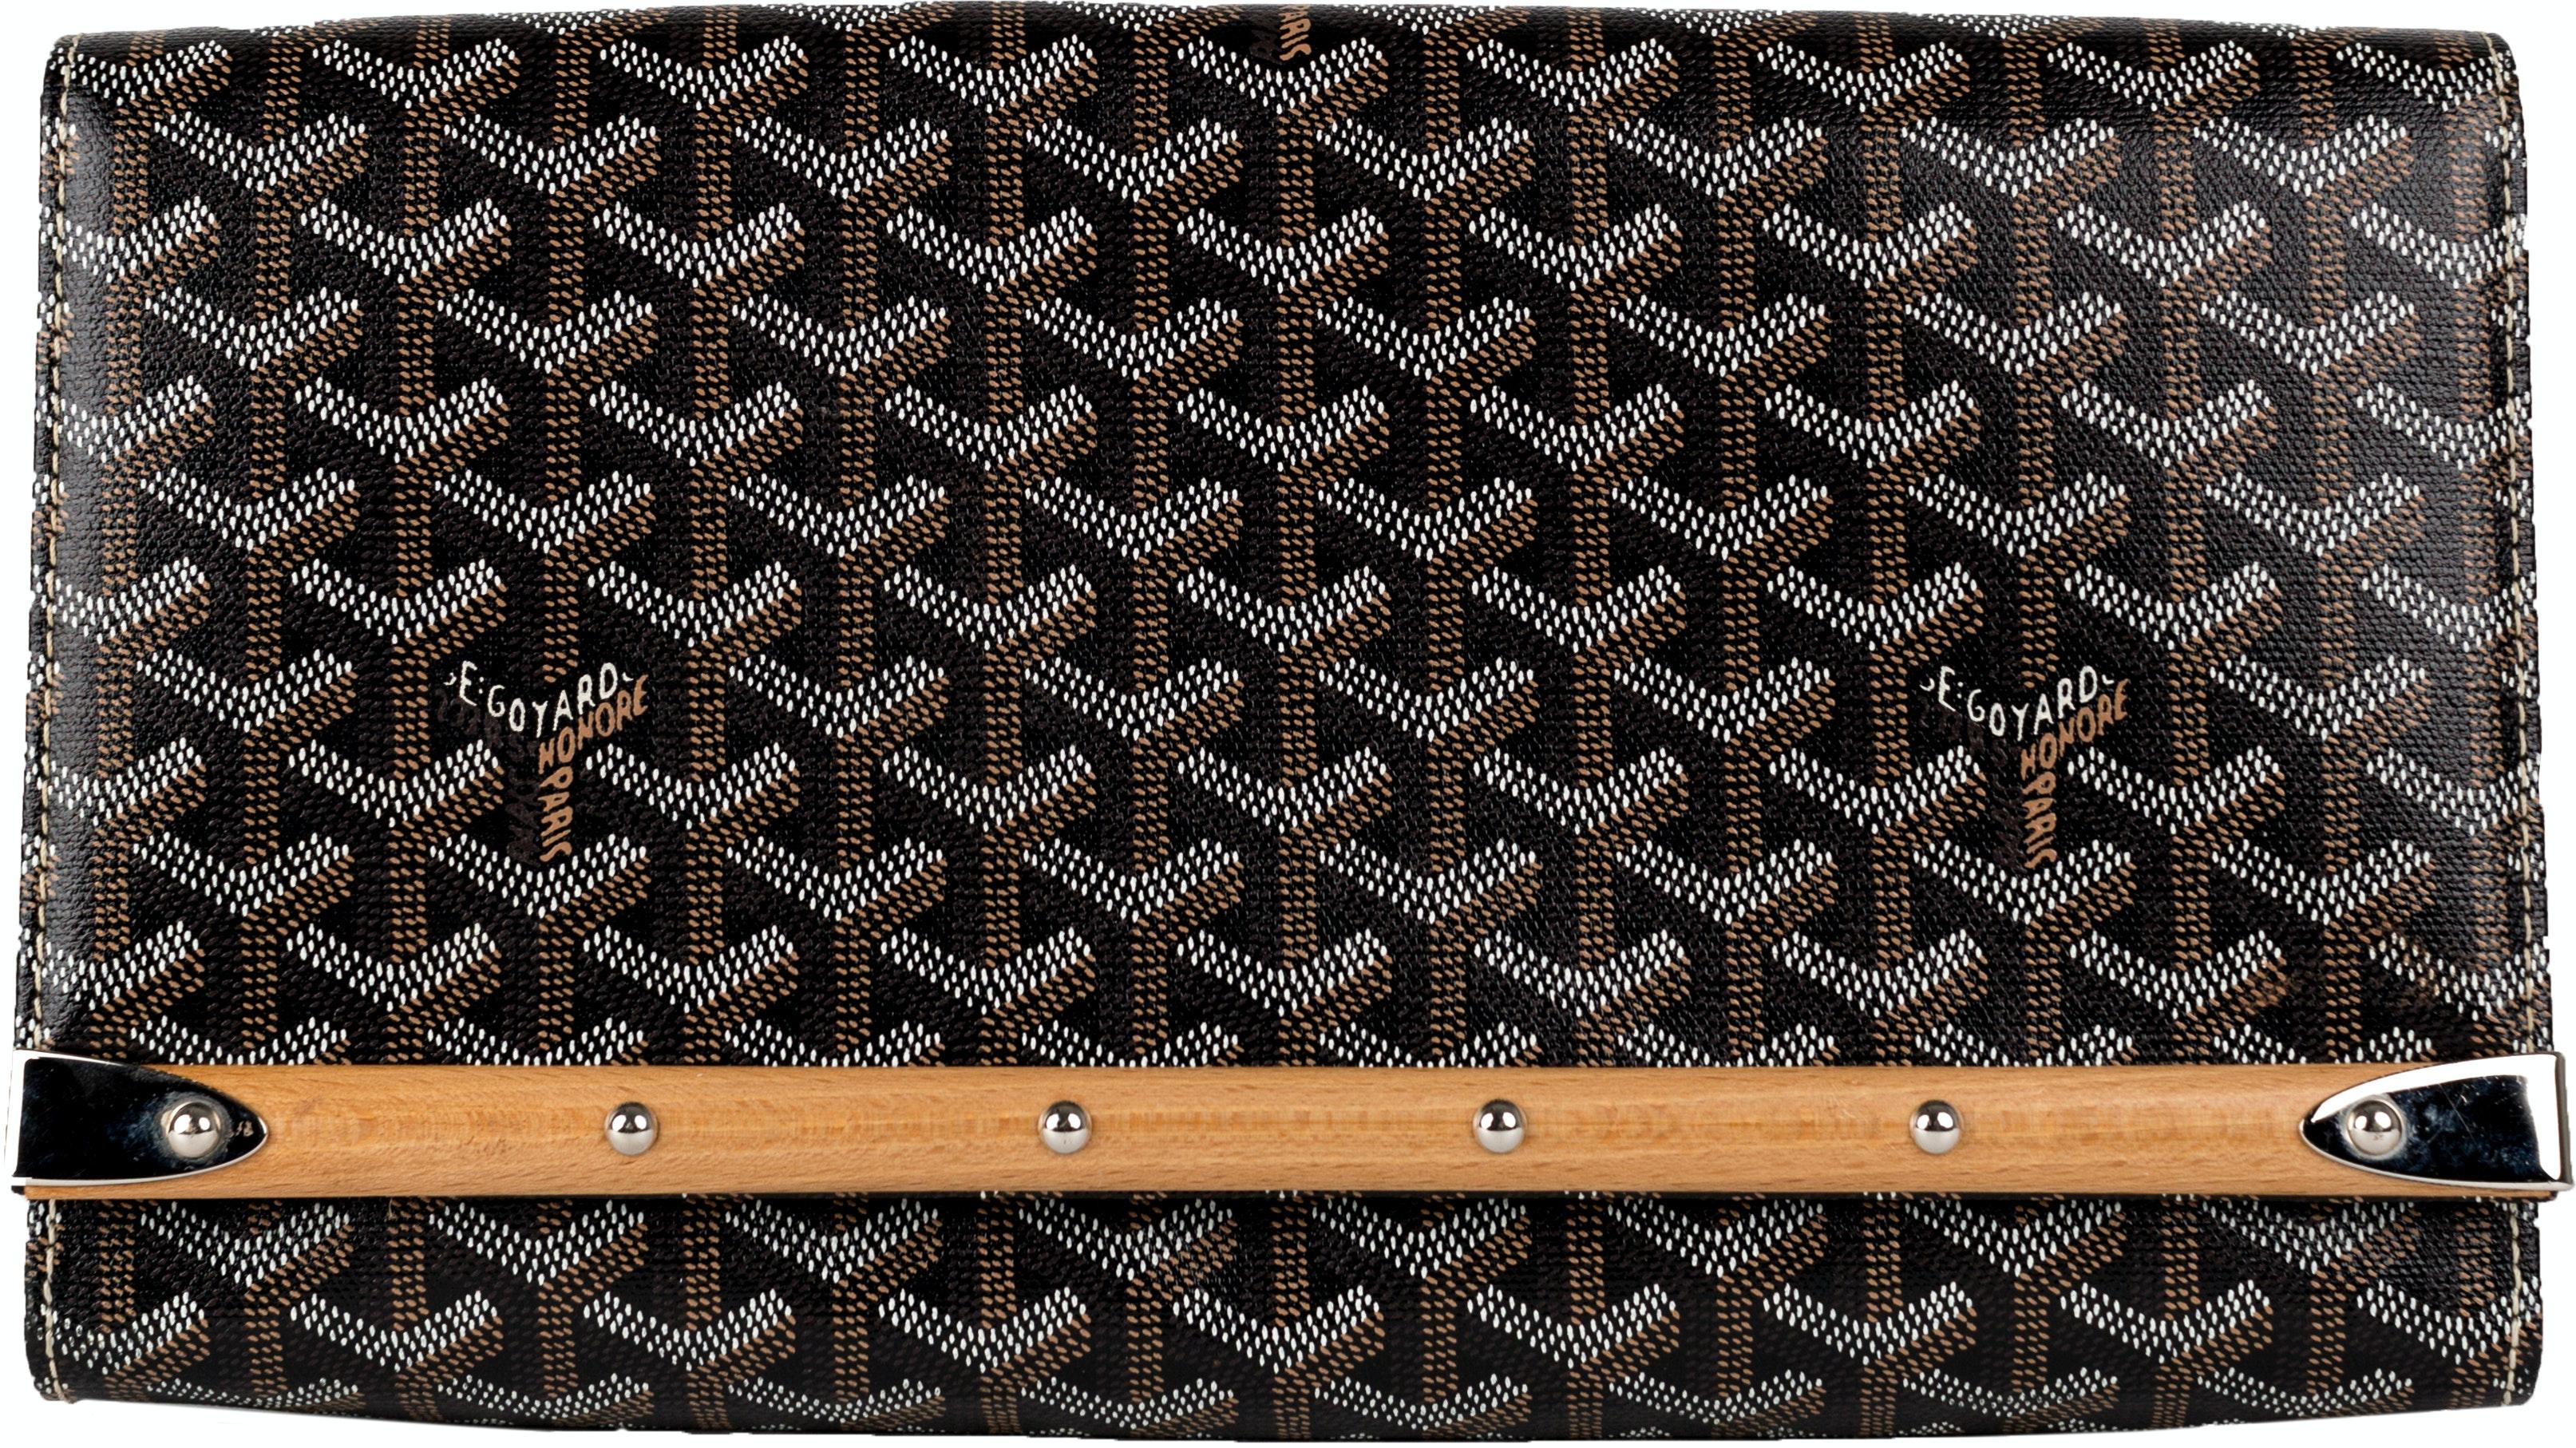 Goyard Monte Carlo Clutch Monogram Chevron Wood Trim Black